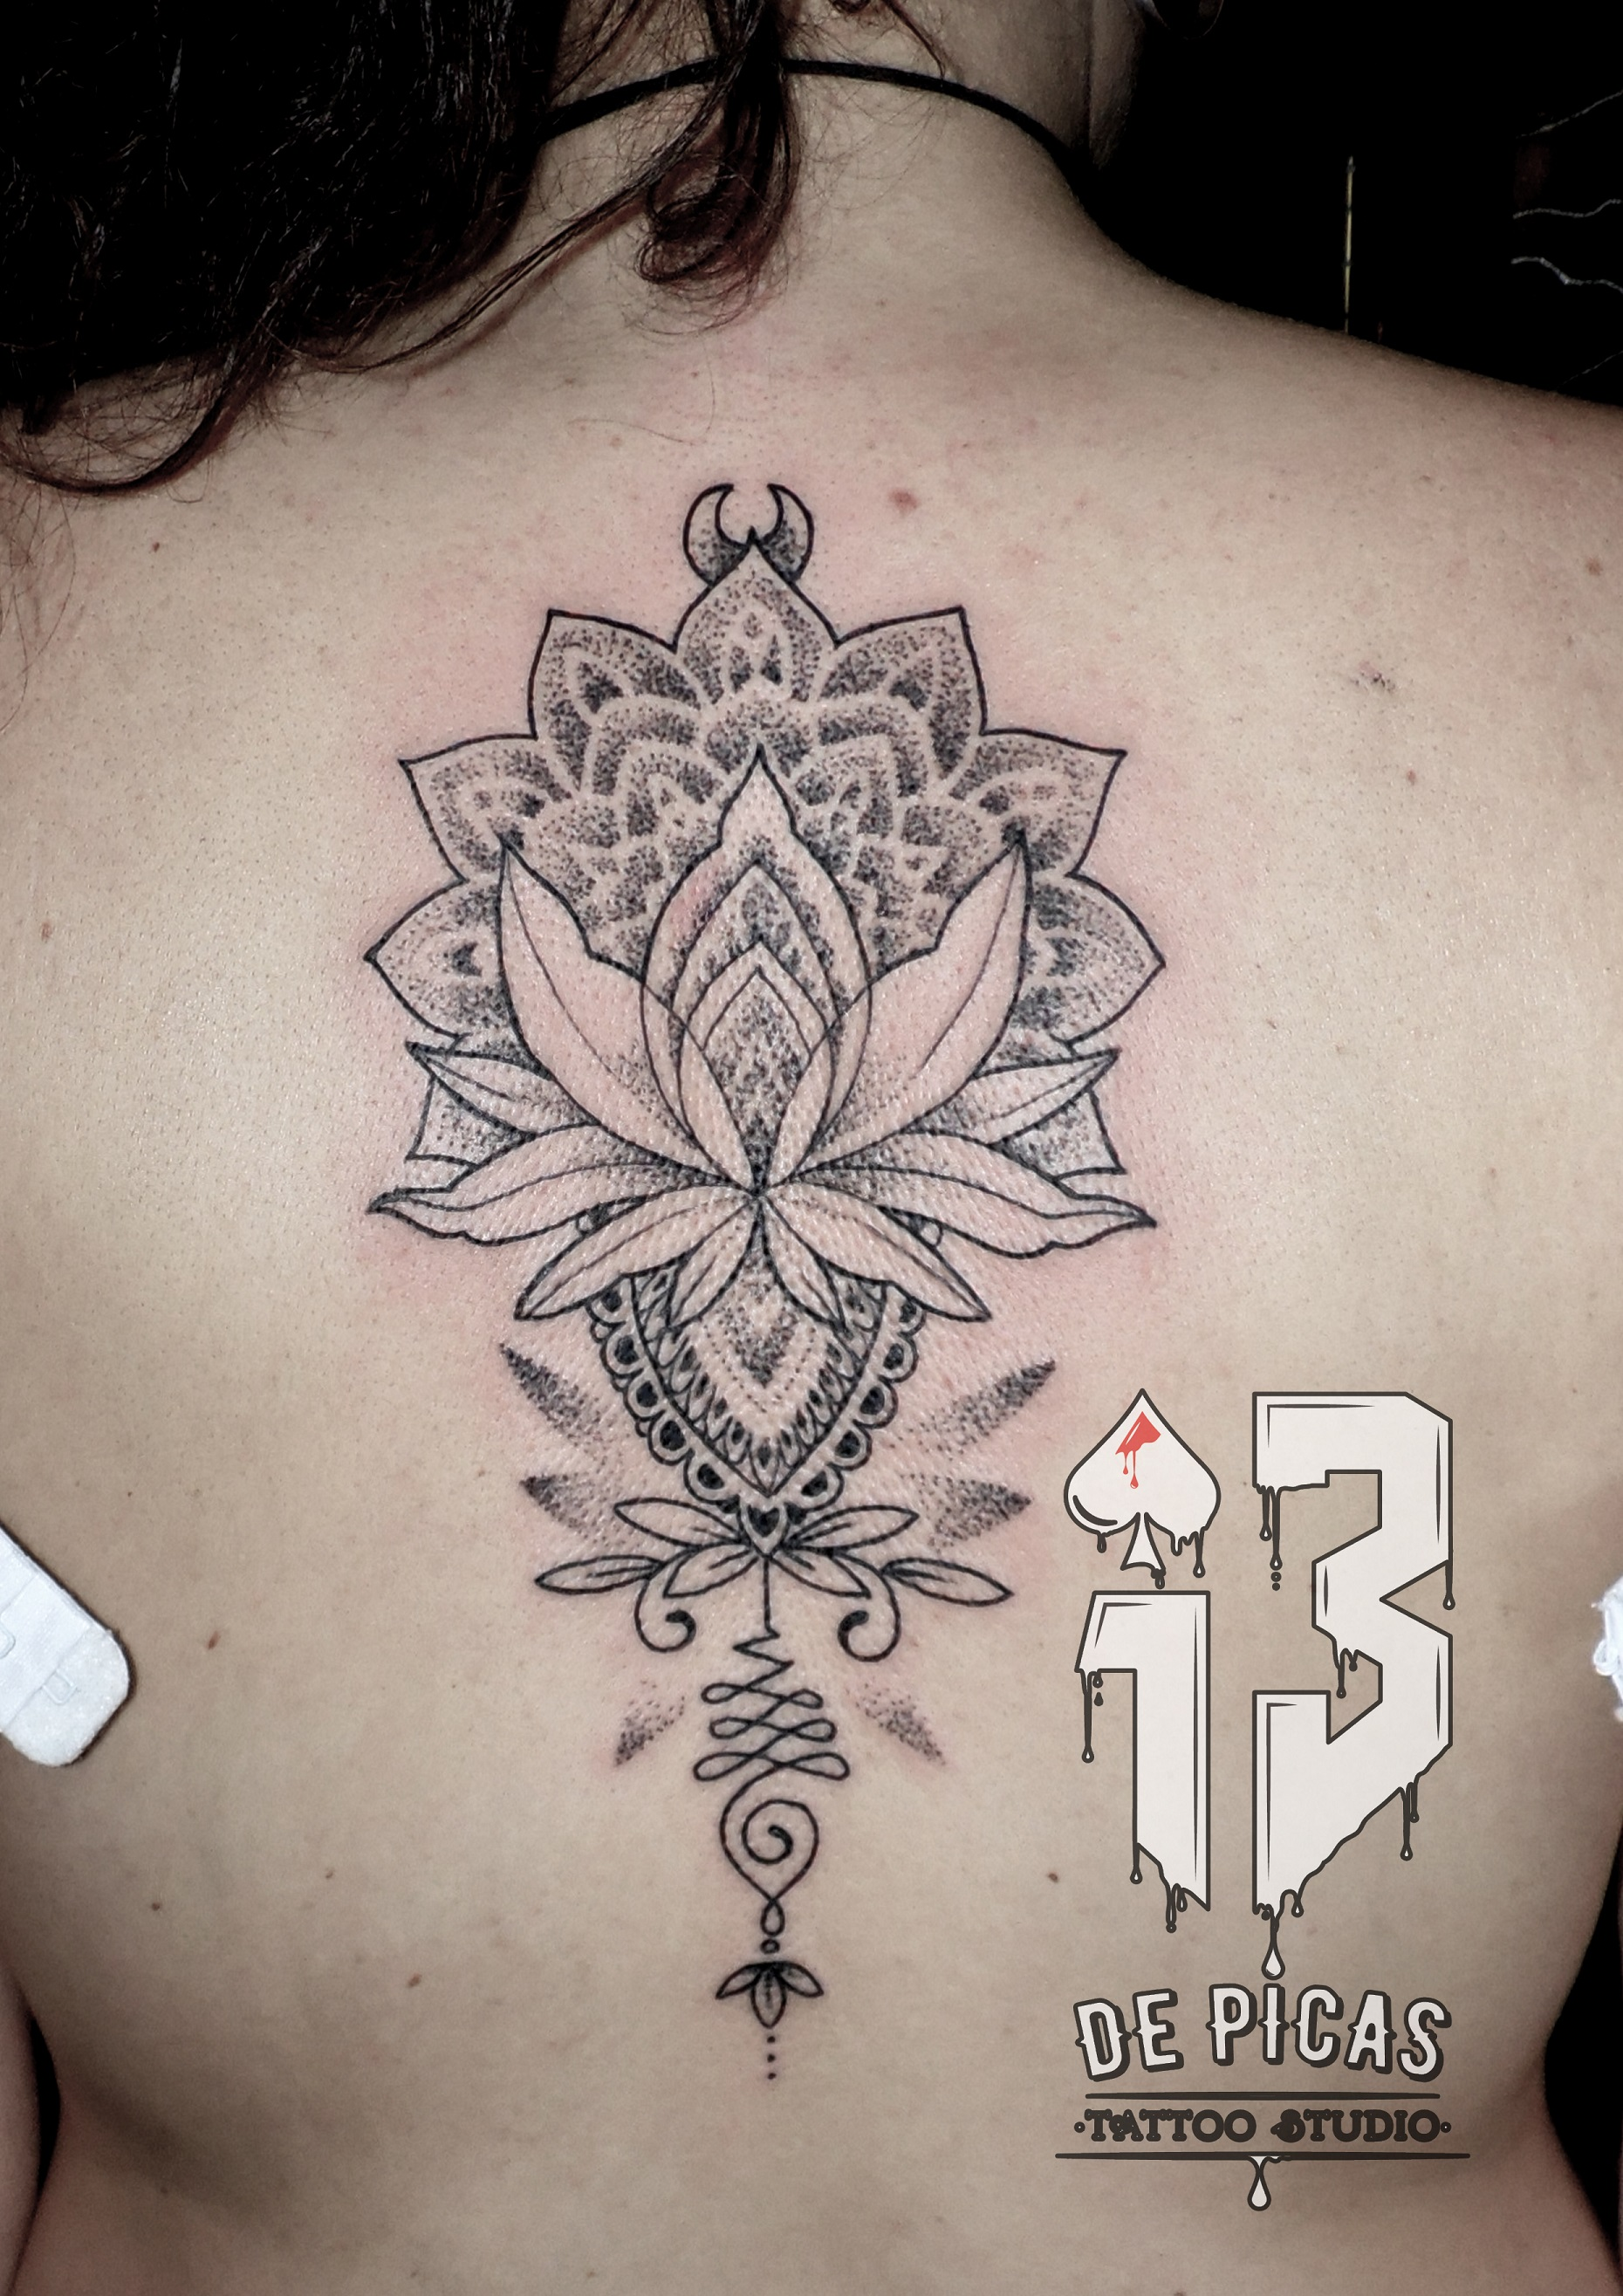 mandala espalda lineal flor unalome tatuaje tattoo 13 de picas jaca huesca